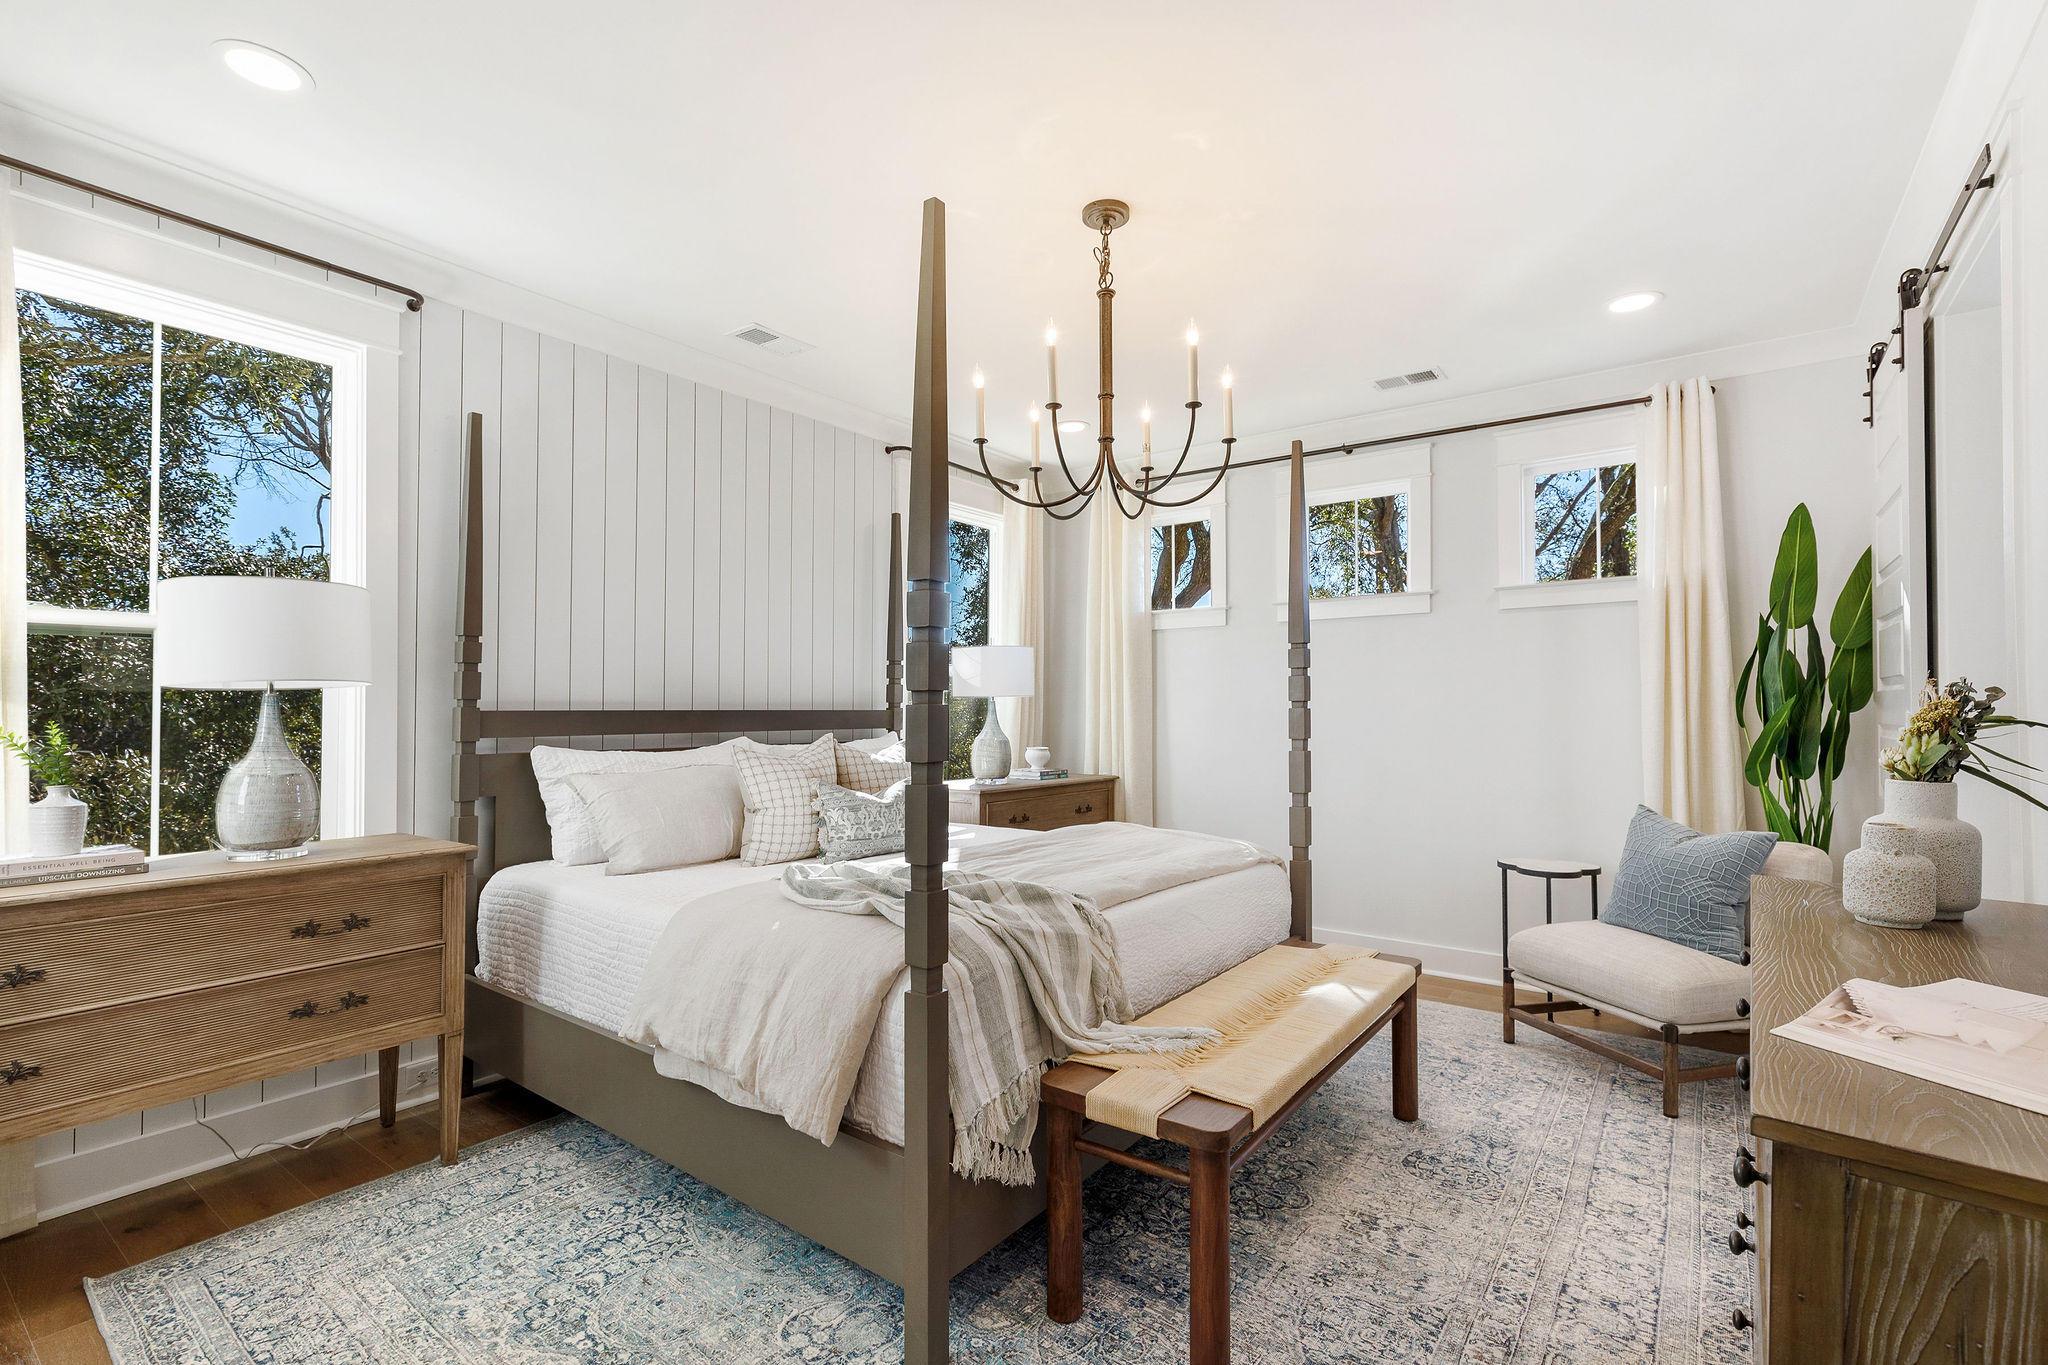 Avenue of Oaks Homes For Sale - 1027 Avenue Of Oaks, Charleston, SC - 26